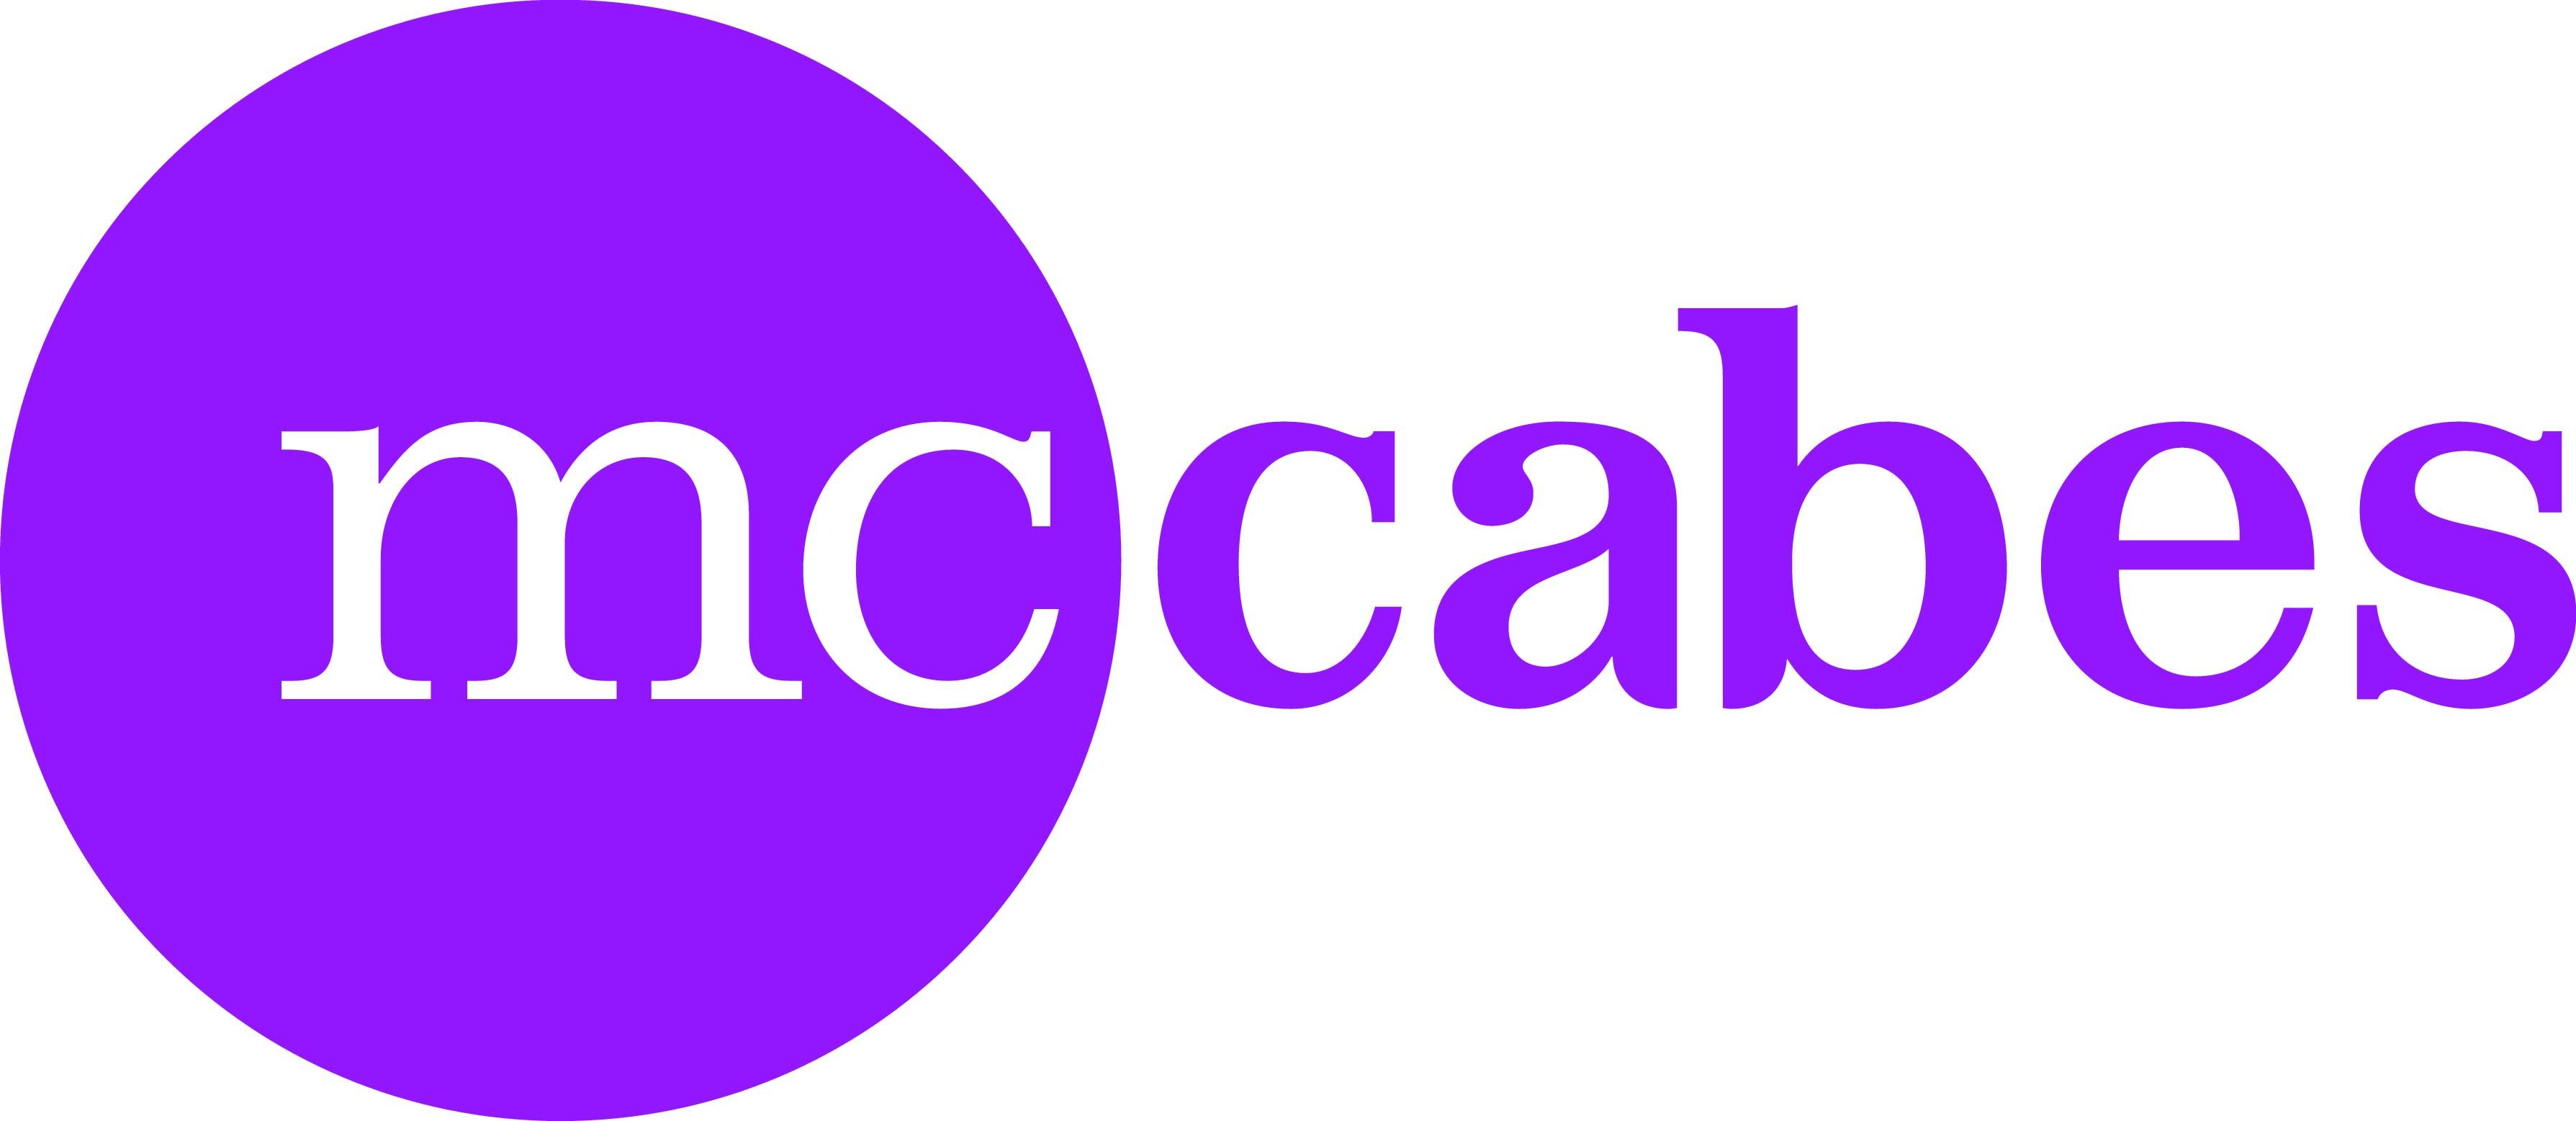 McCabes_Logo_PURPLE_CMYK.eps_(3).png